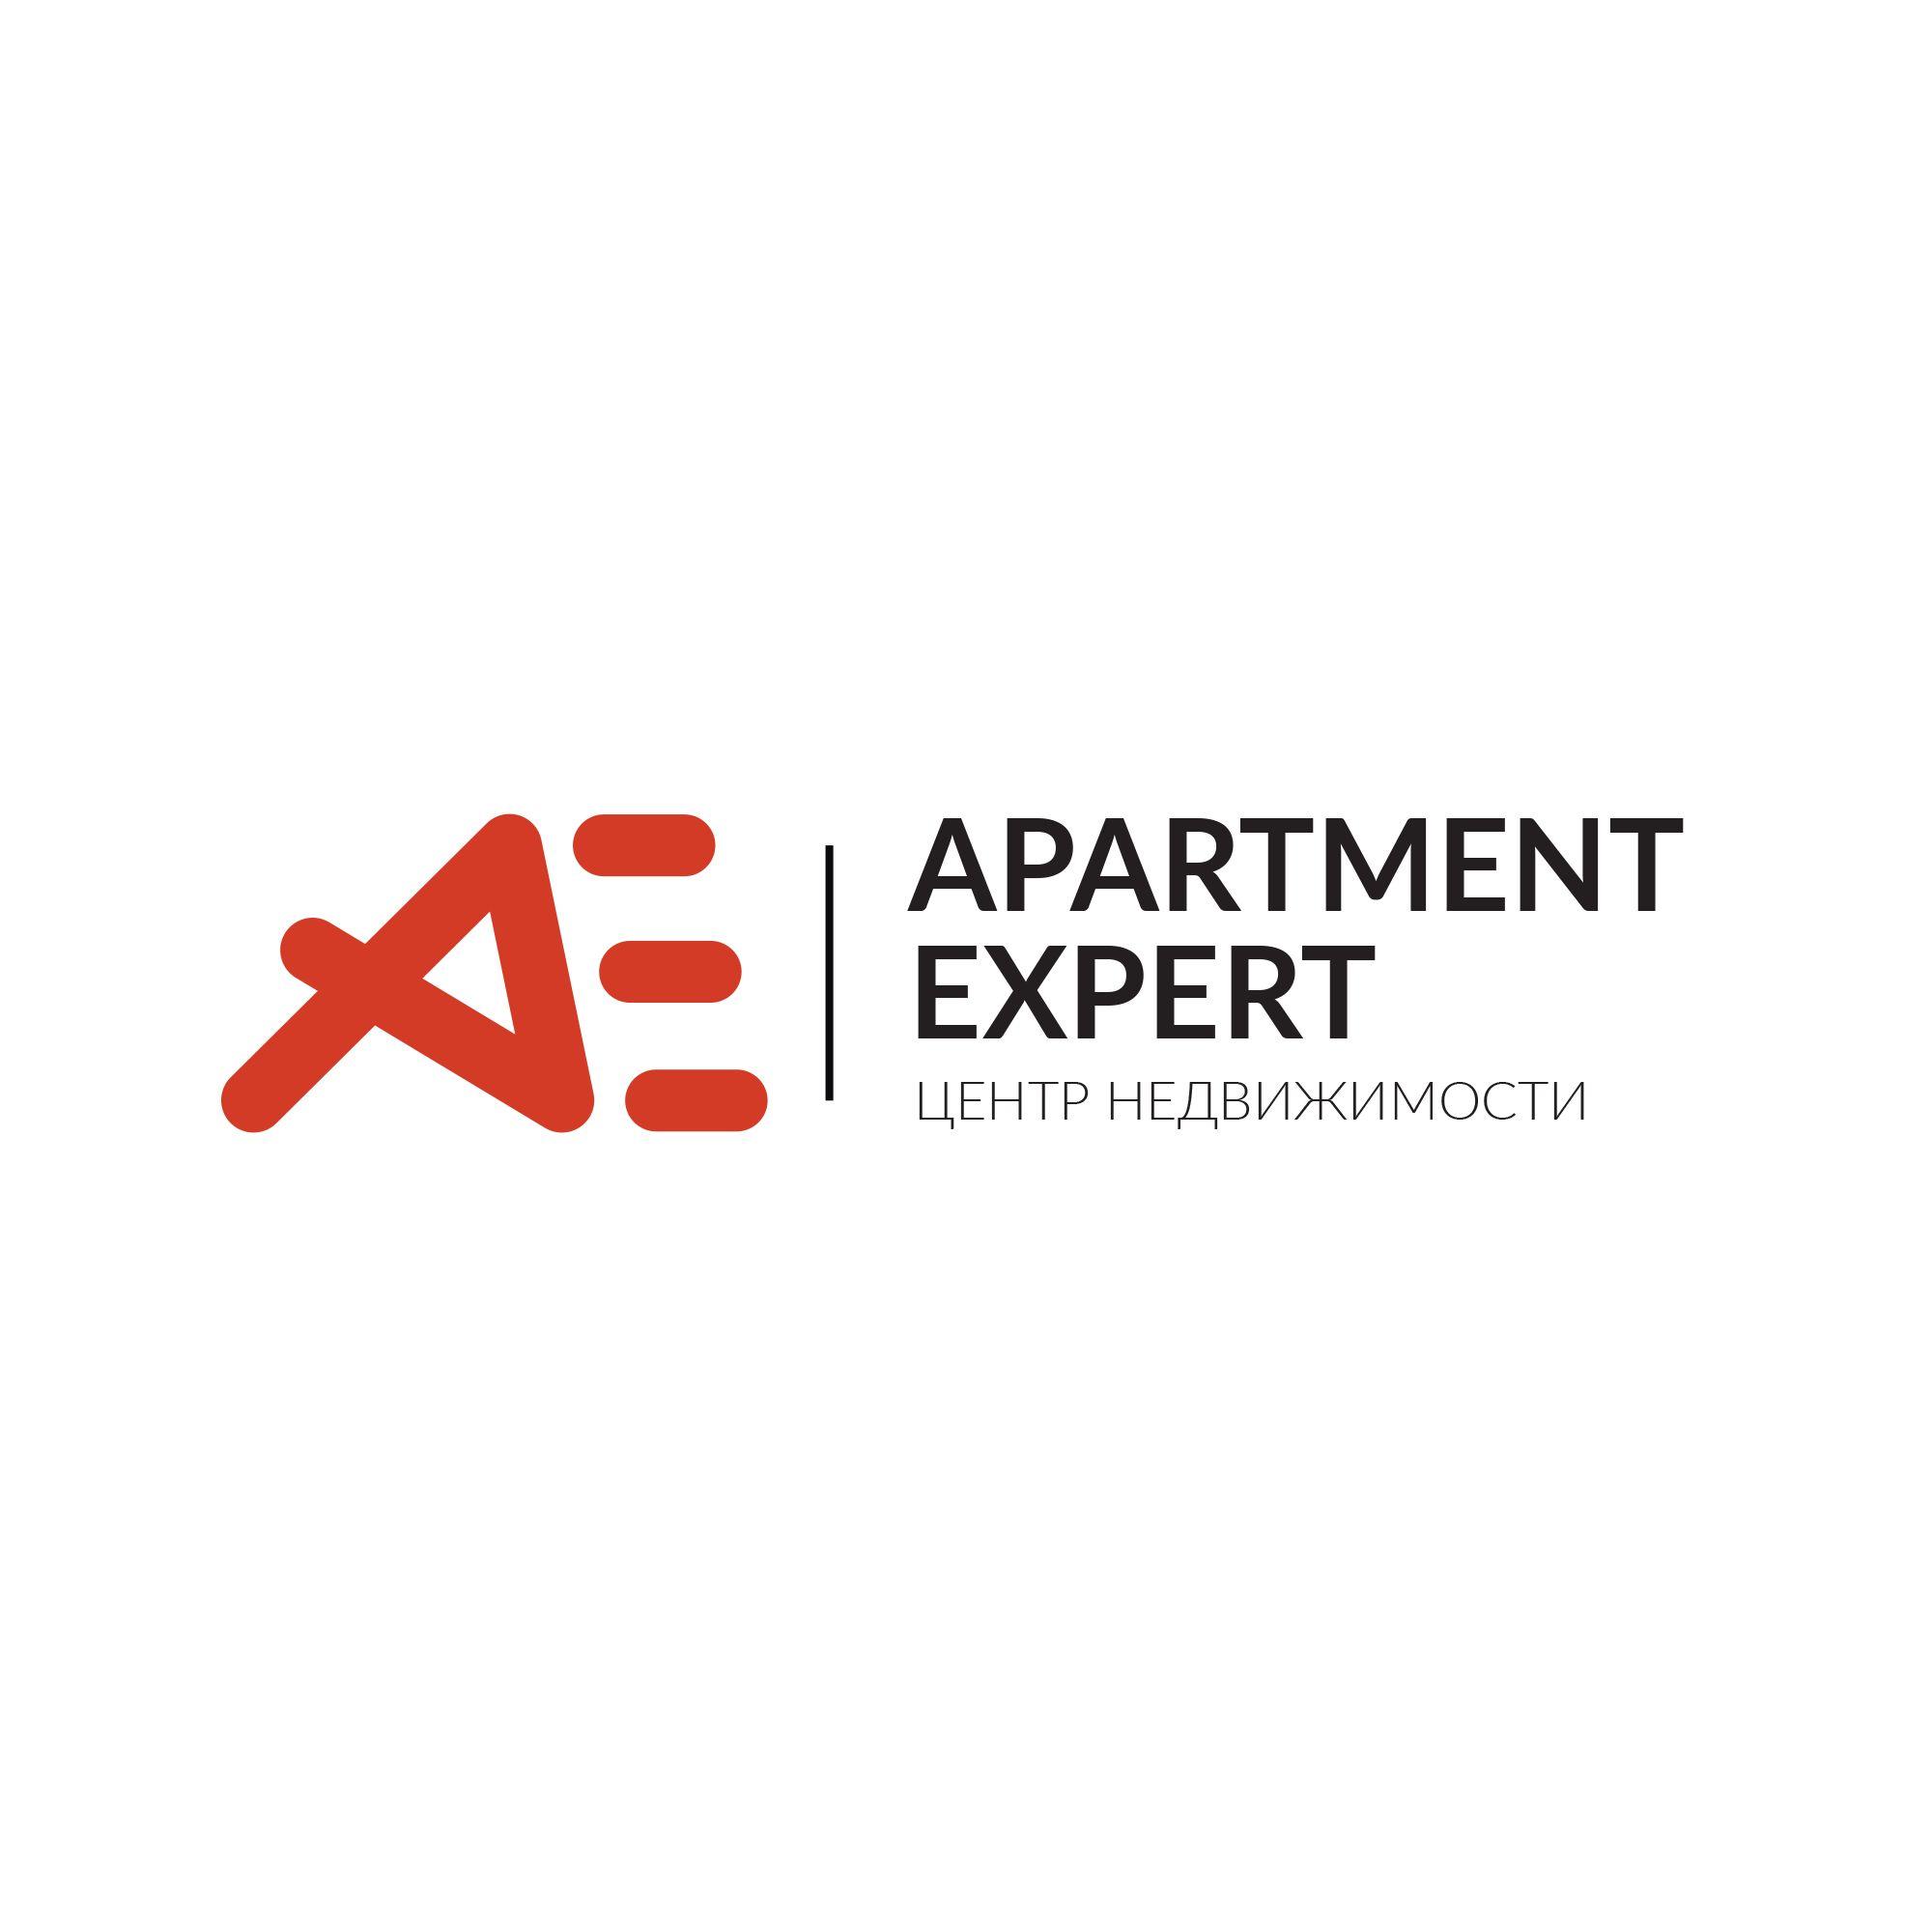 Логотип для APARTMENT EXPERT - ЦЕНТР НЕДВИЖИМОСТИ - дизайнер Kir_Abrams